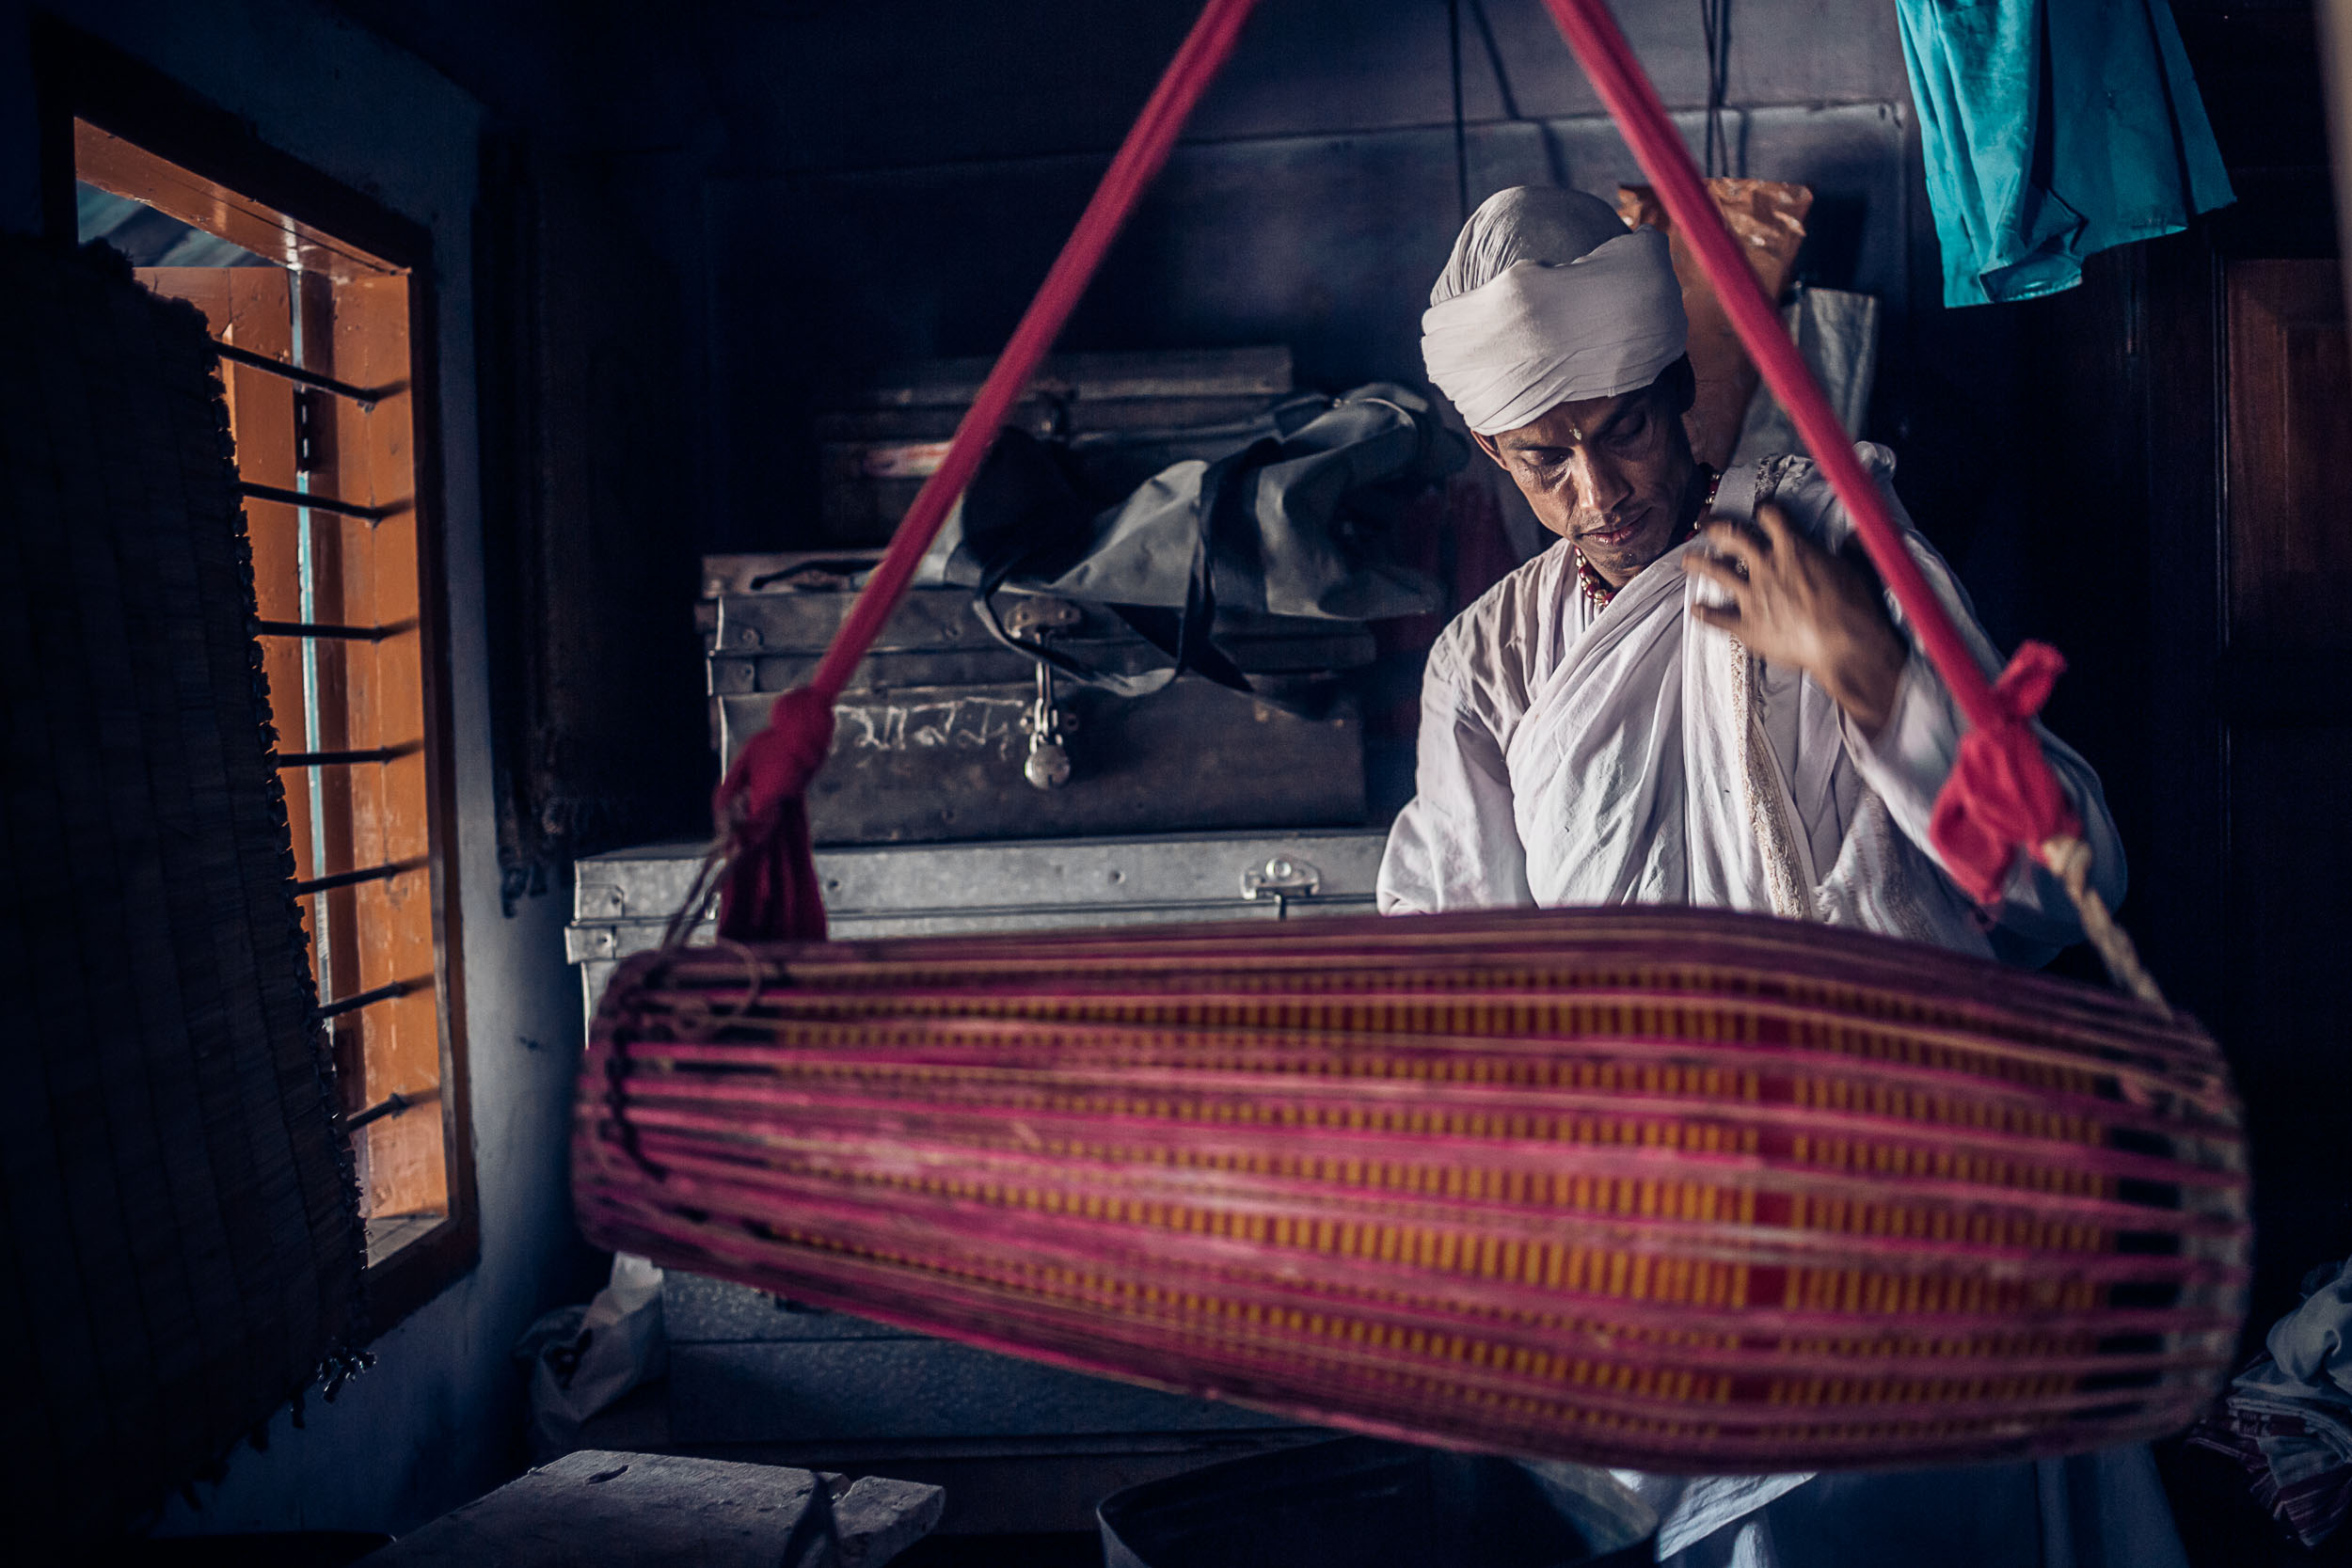 Sindhur_Photography_Travel_People_Majuli-22.JPG